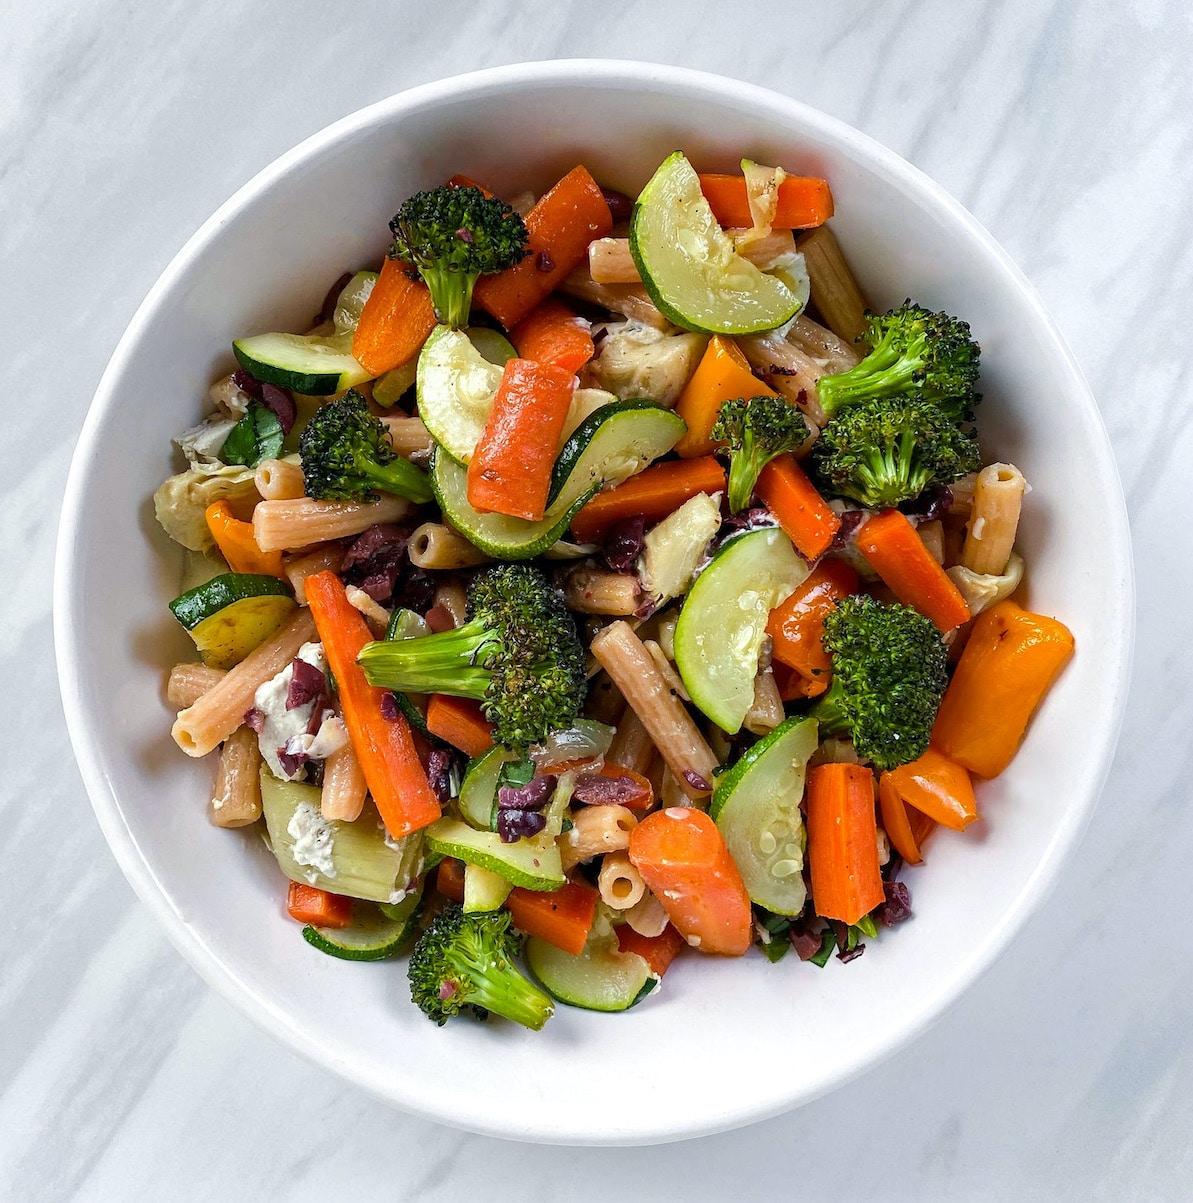 Bright pasta primavera with carrots, broccoli, and veggies in a white dinner bowl